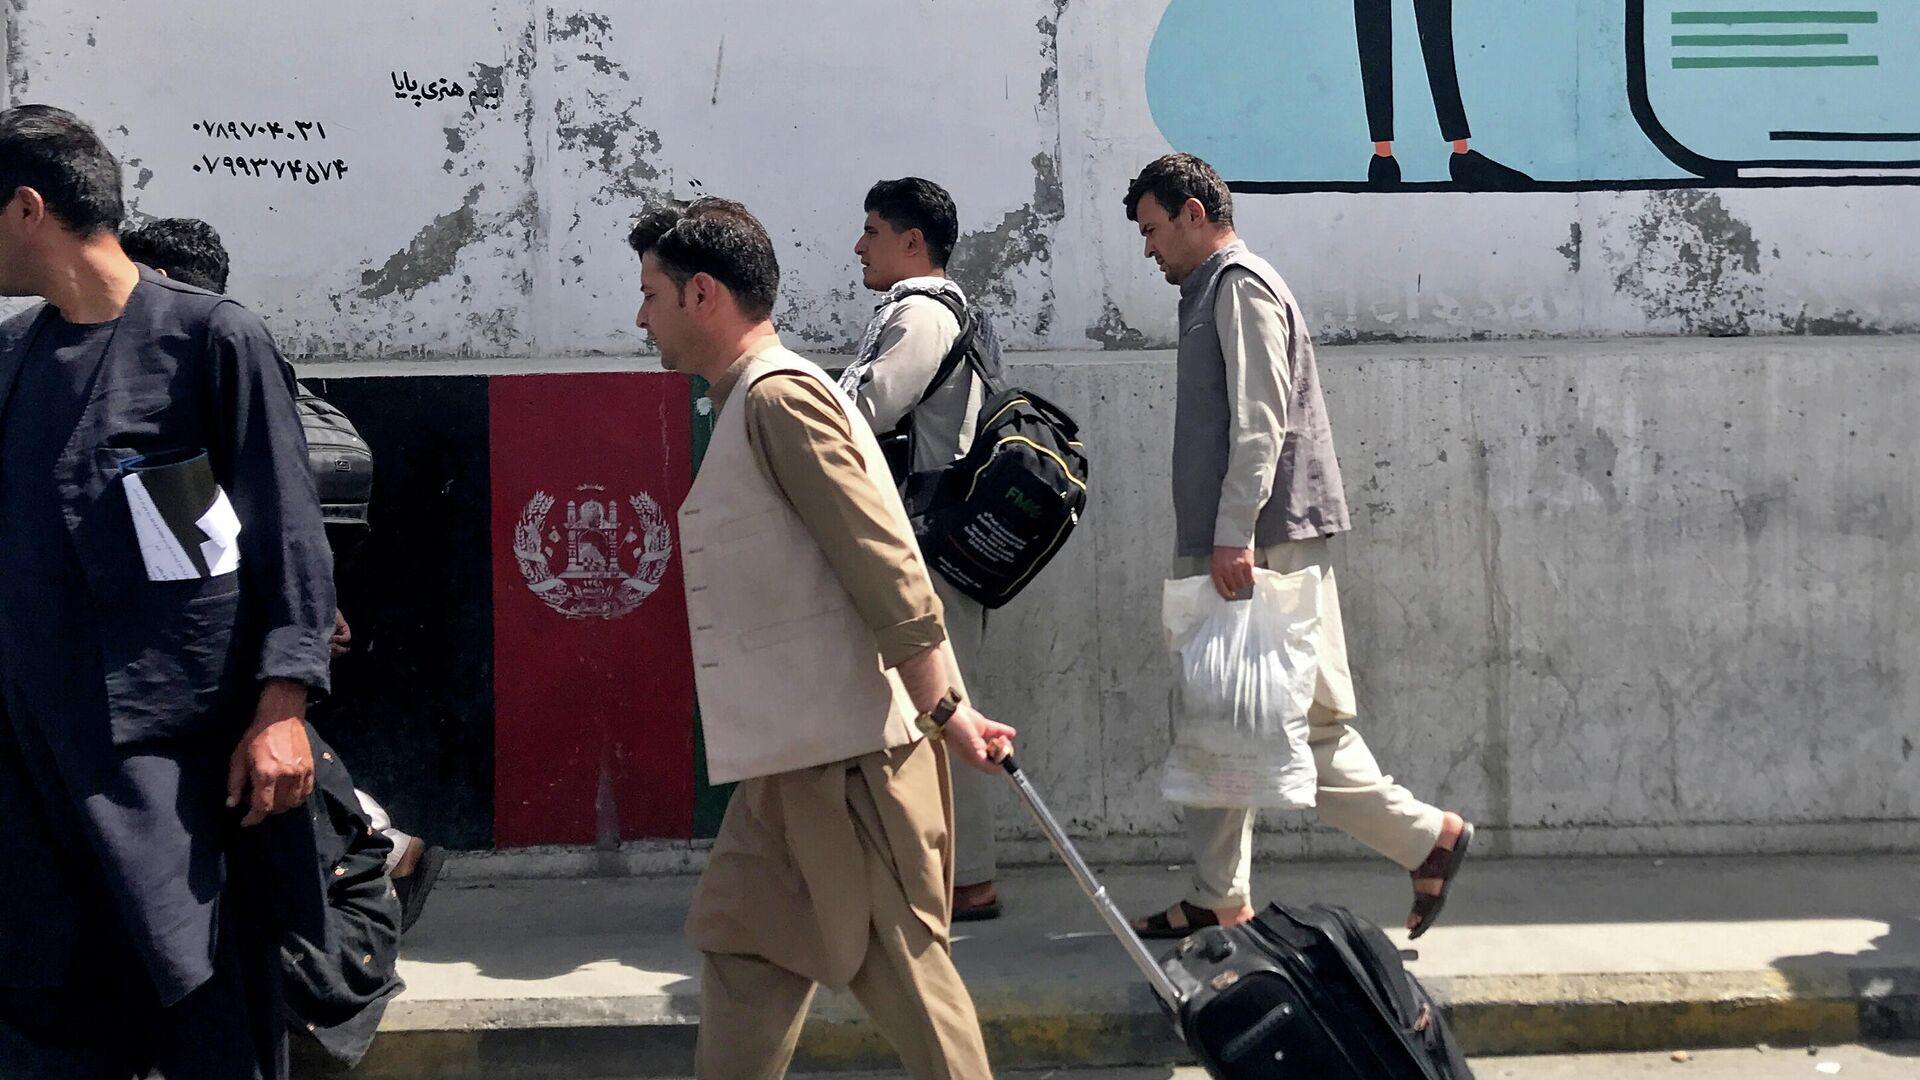 Los pasajeros en el aeropuero de Kabul - Sputnik Mundo, 1920, 16.08.2021